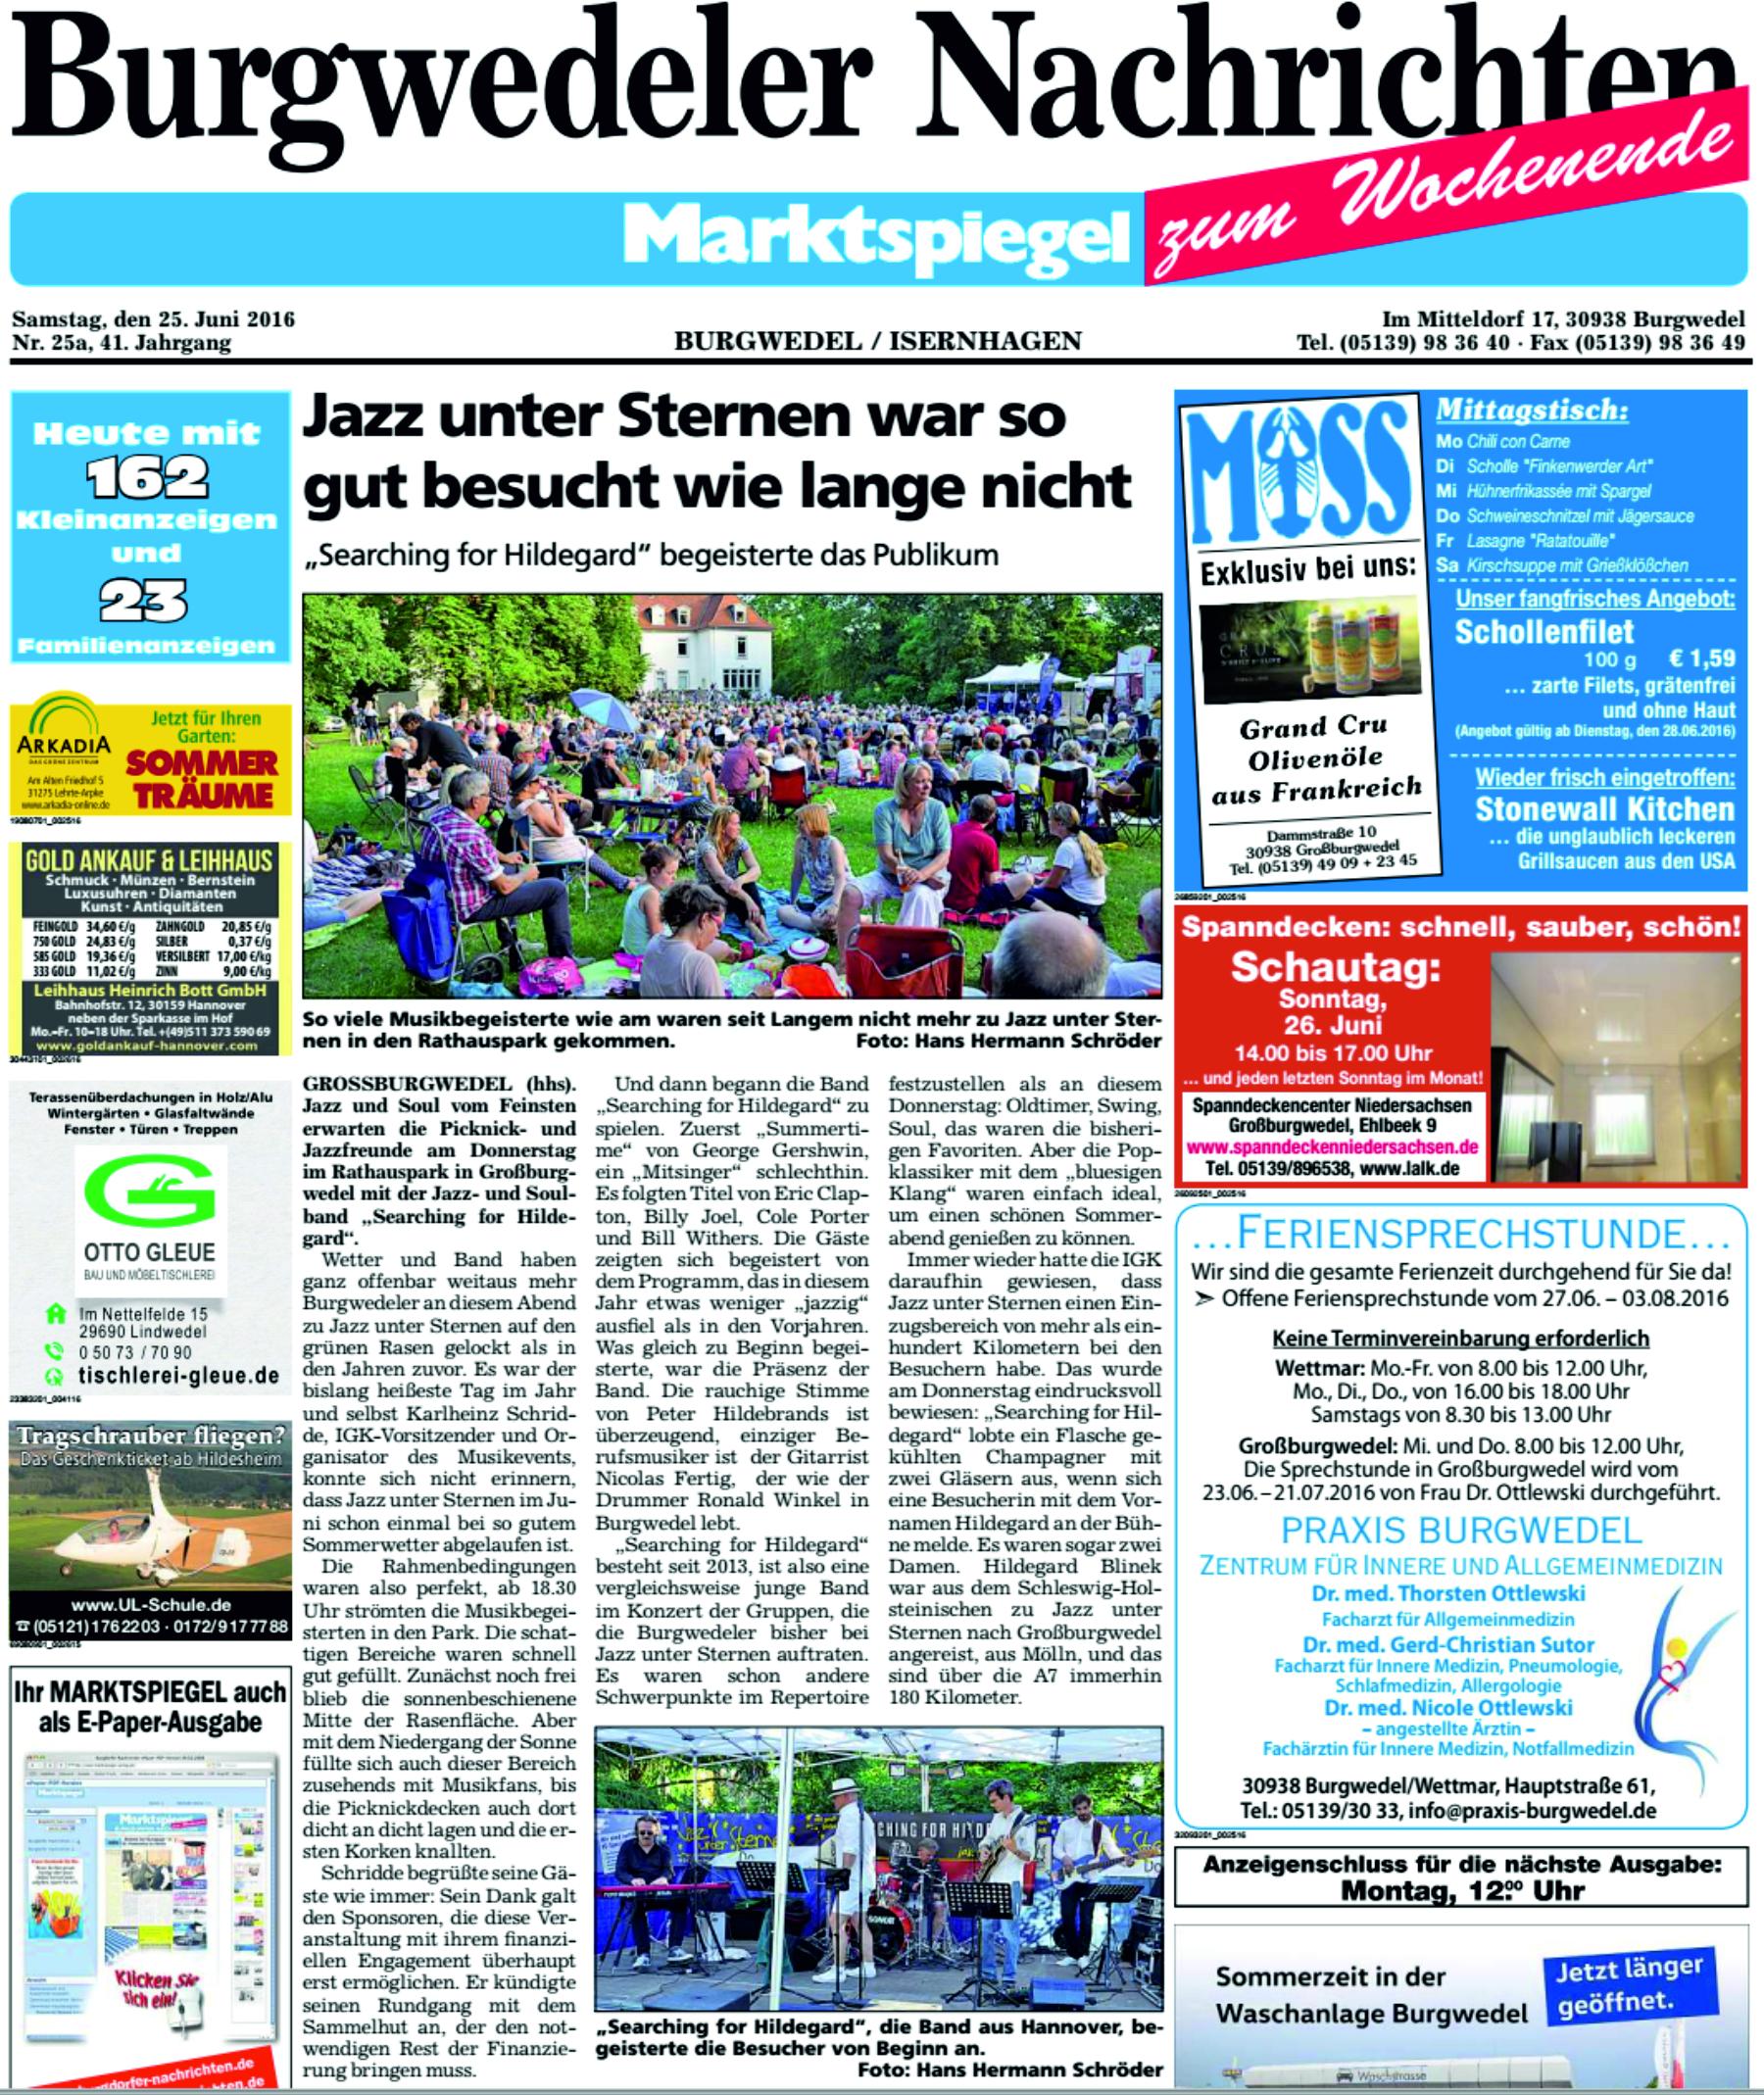 Burgwedeler Nachrichten loben Searching for Hildegard Jazzband Hannover